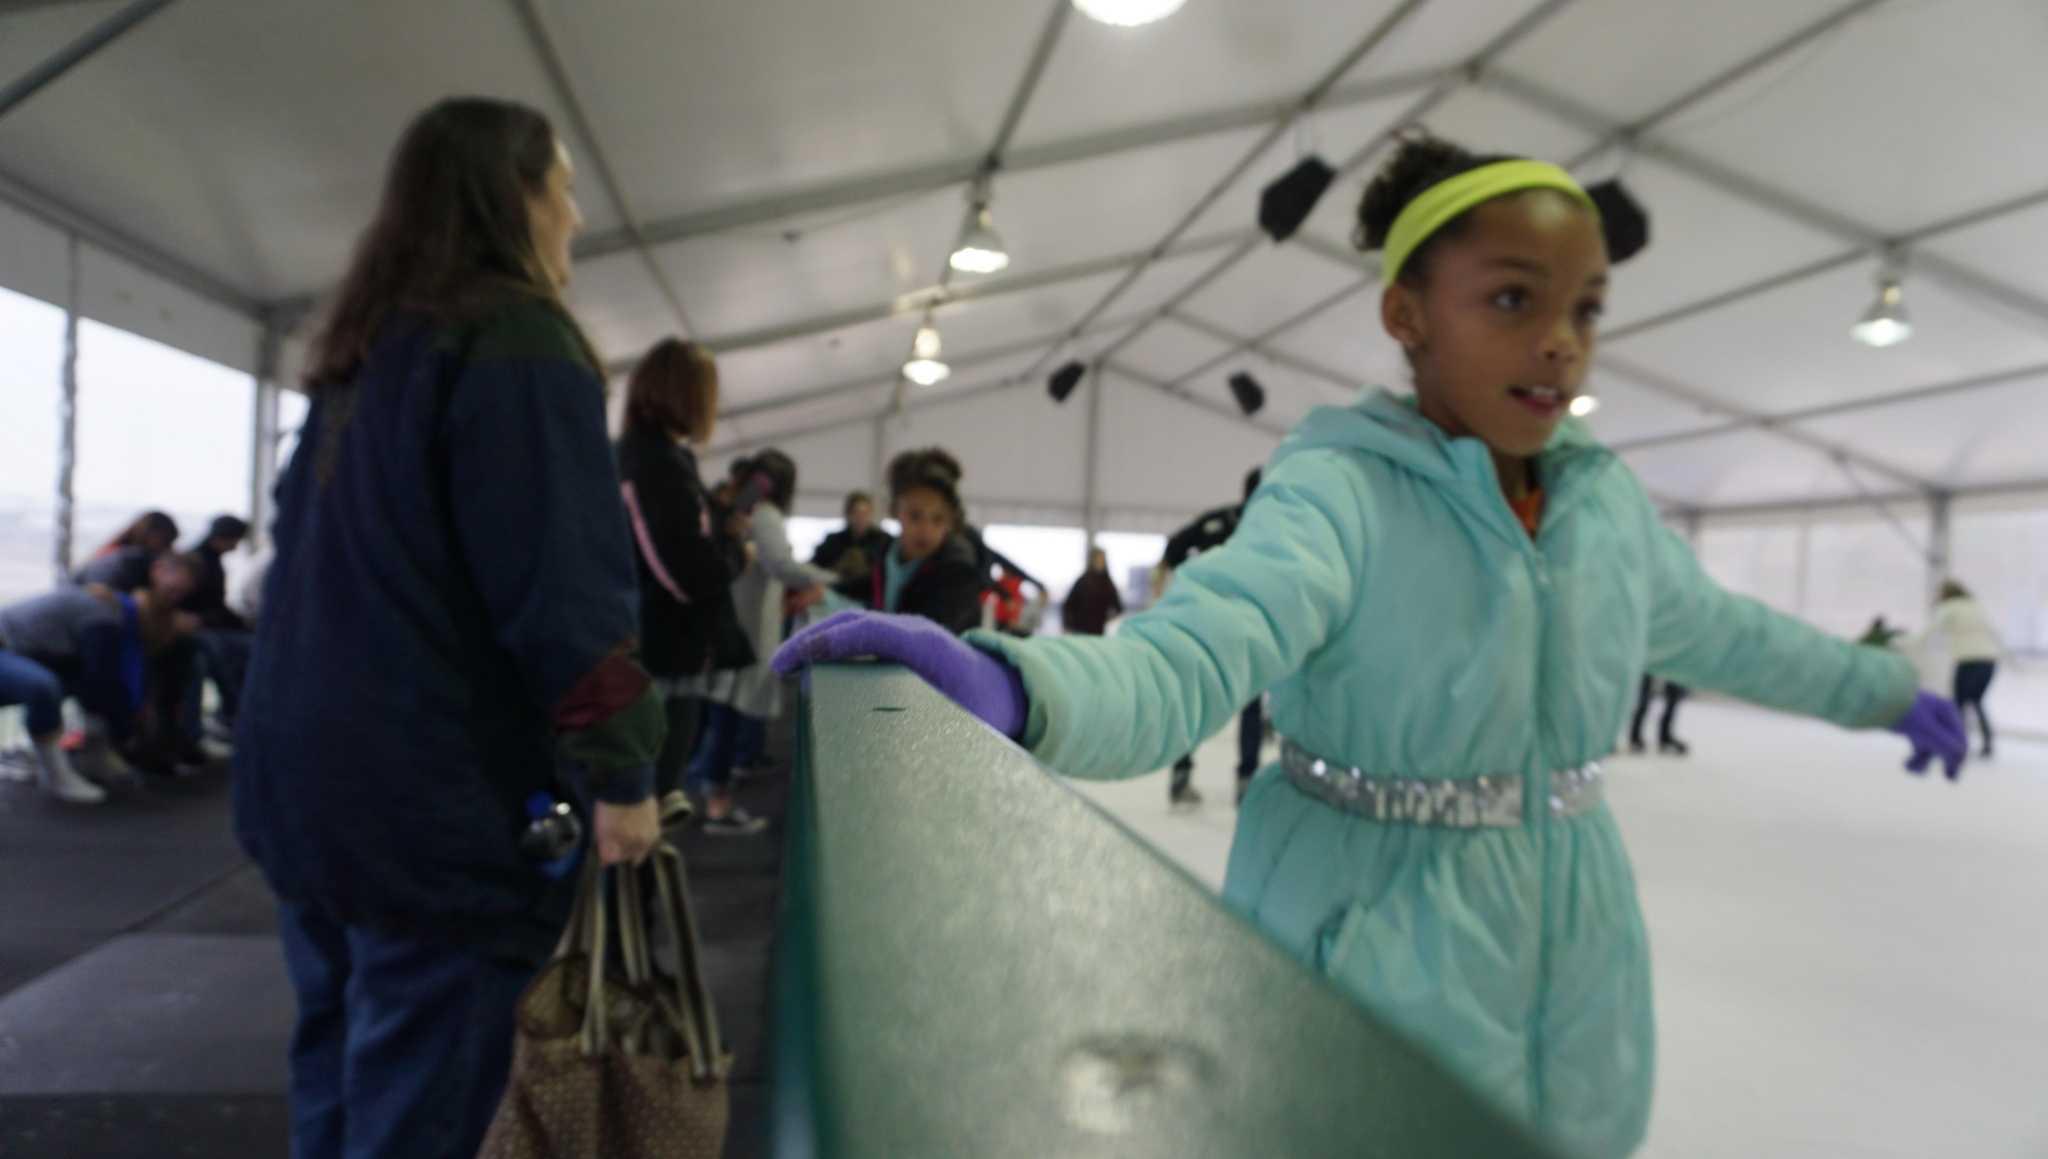 Ice rink at Valley Ranch garners warm reception - Houston ...